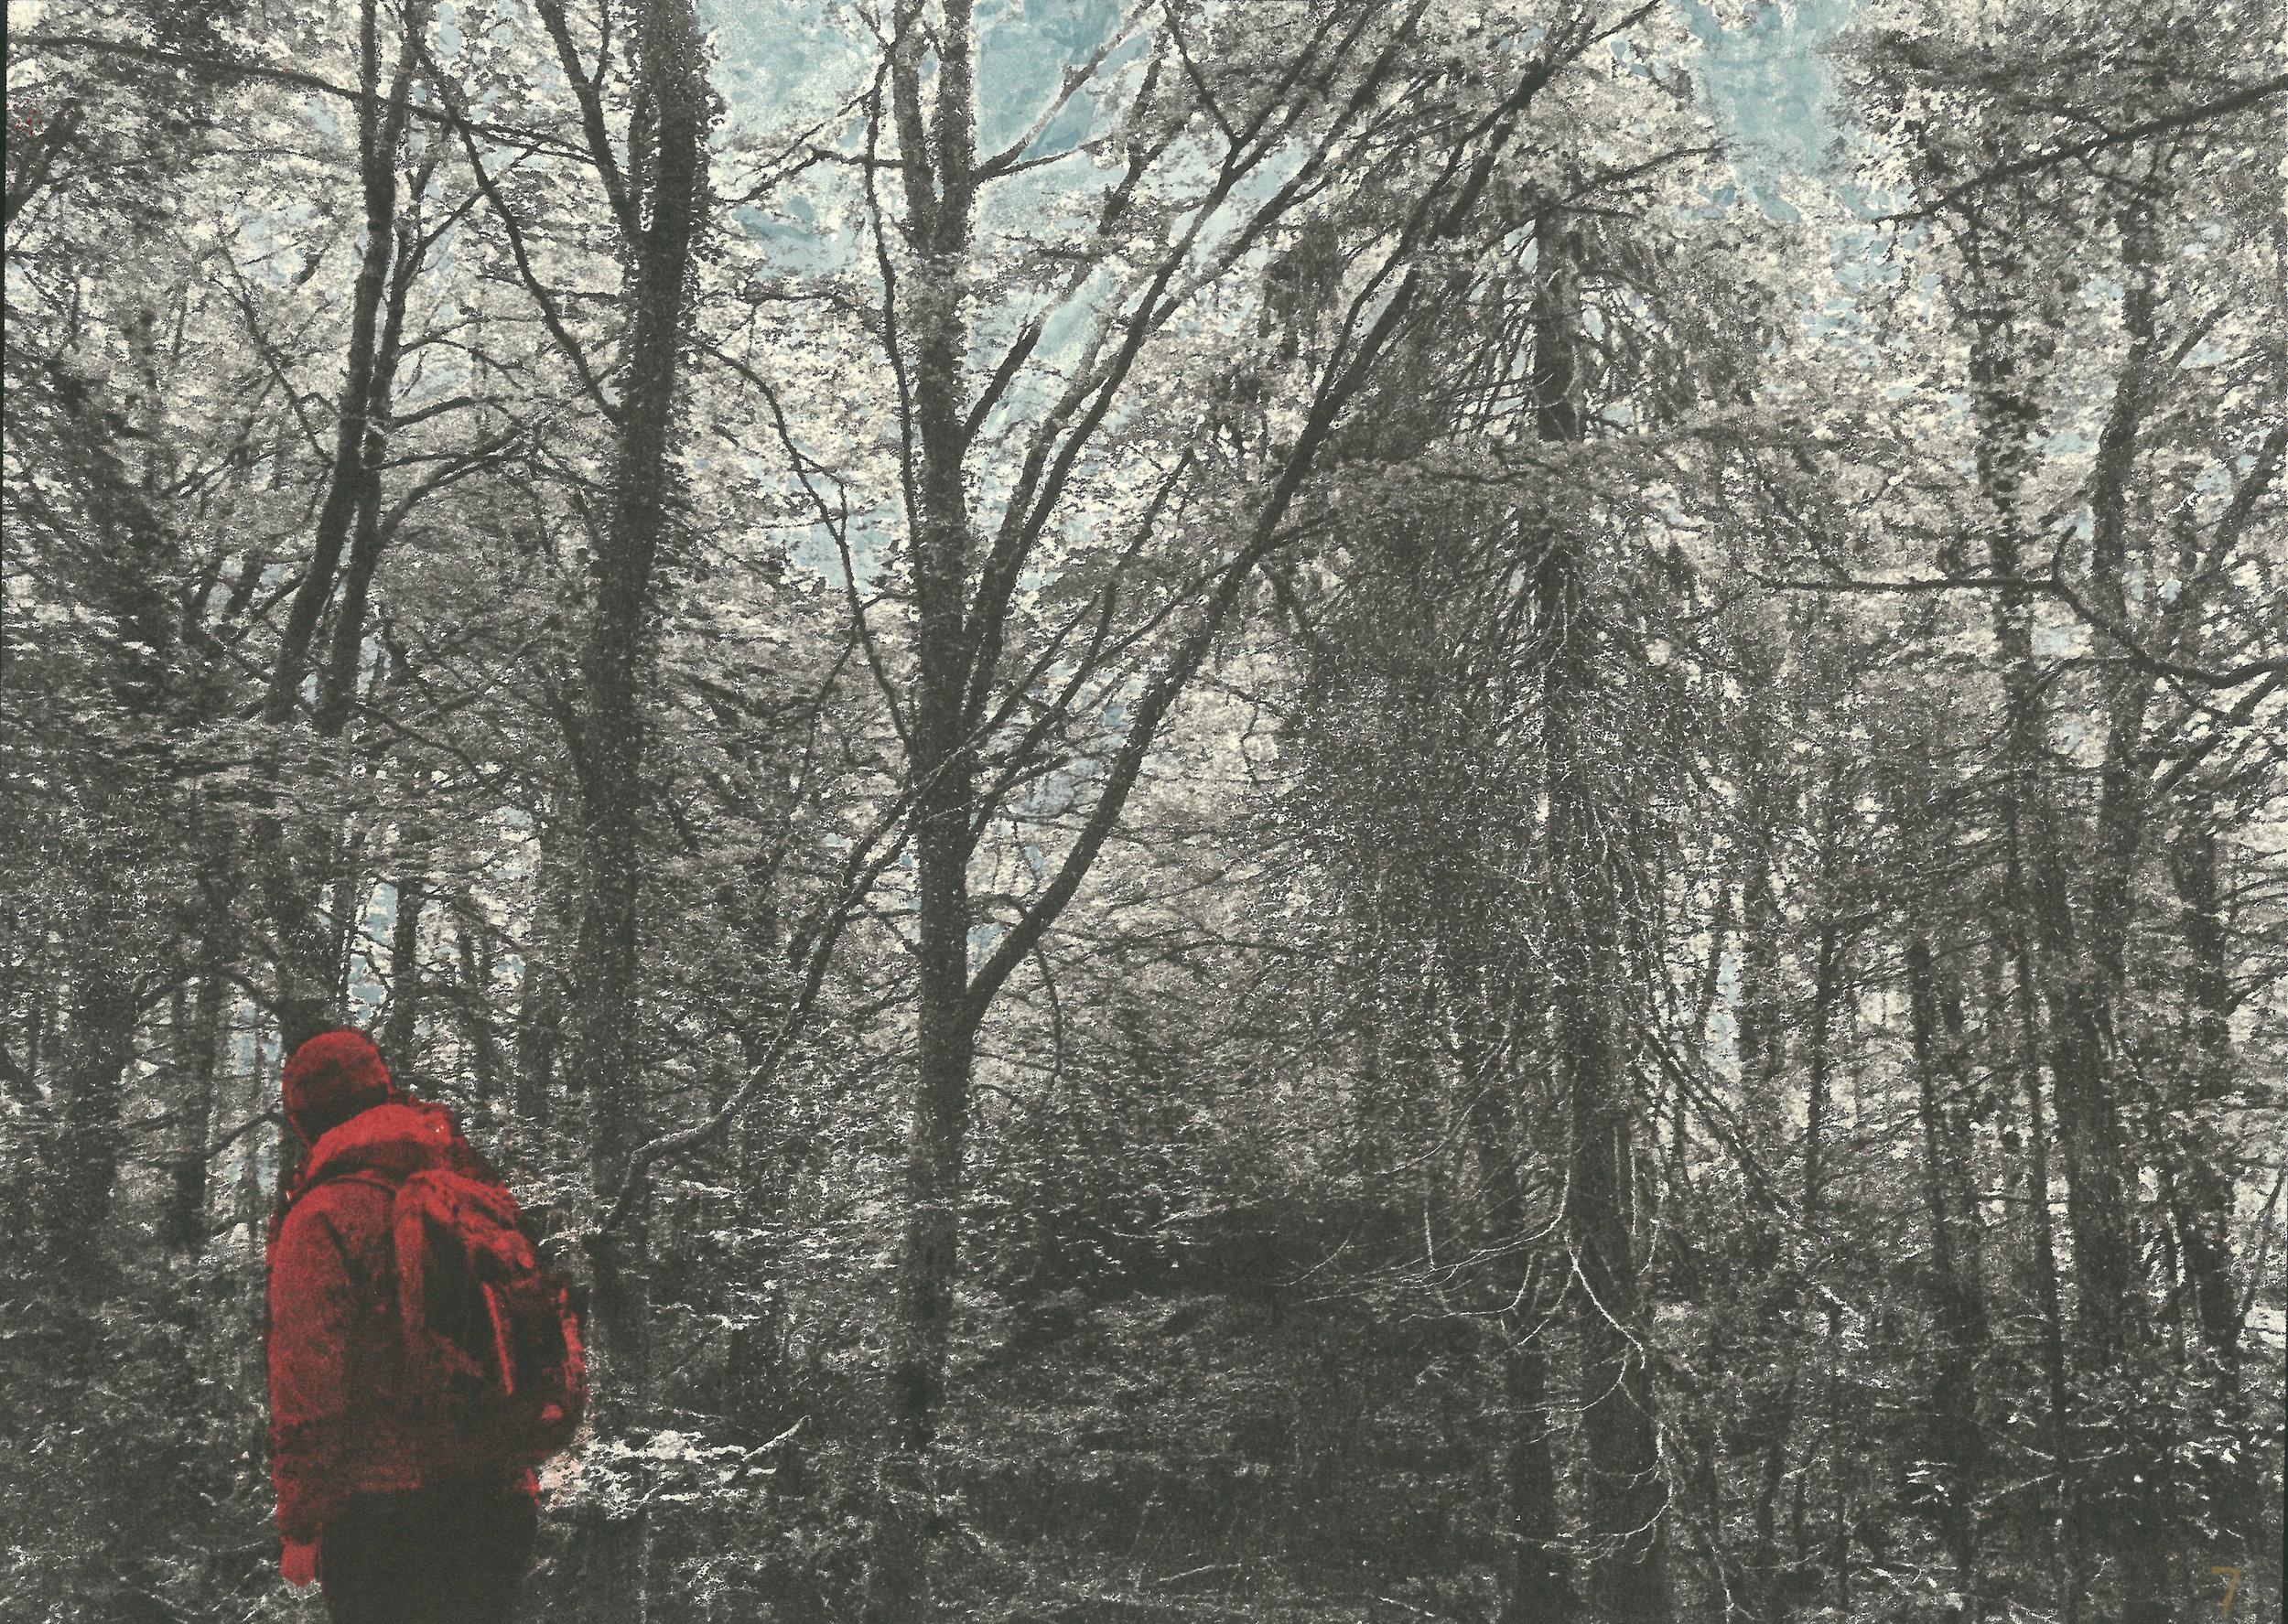 trees_300dpi.jpg